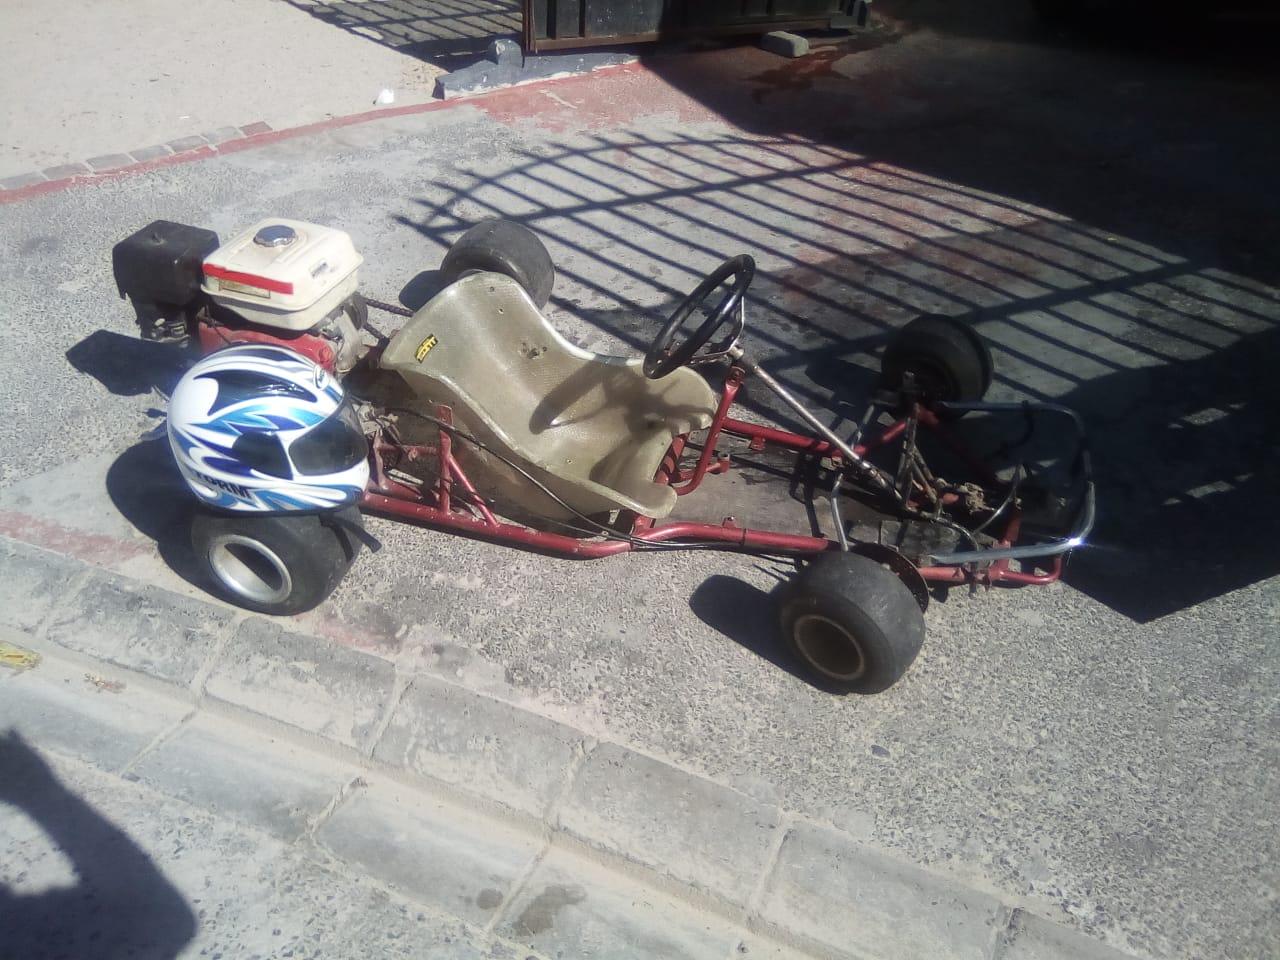 Gokart for sale